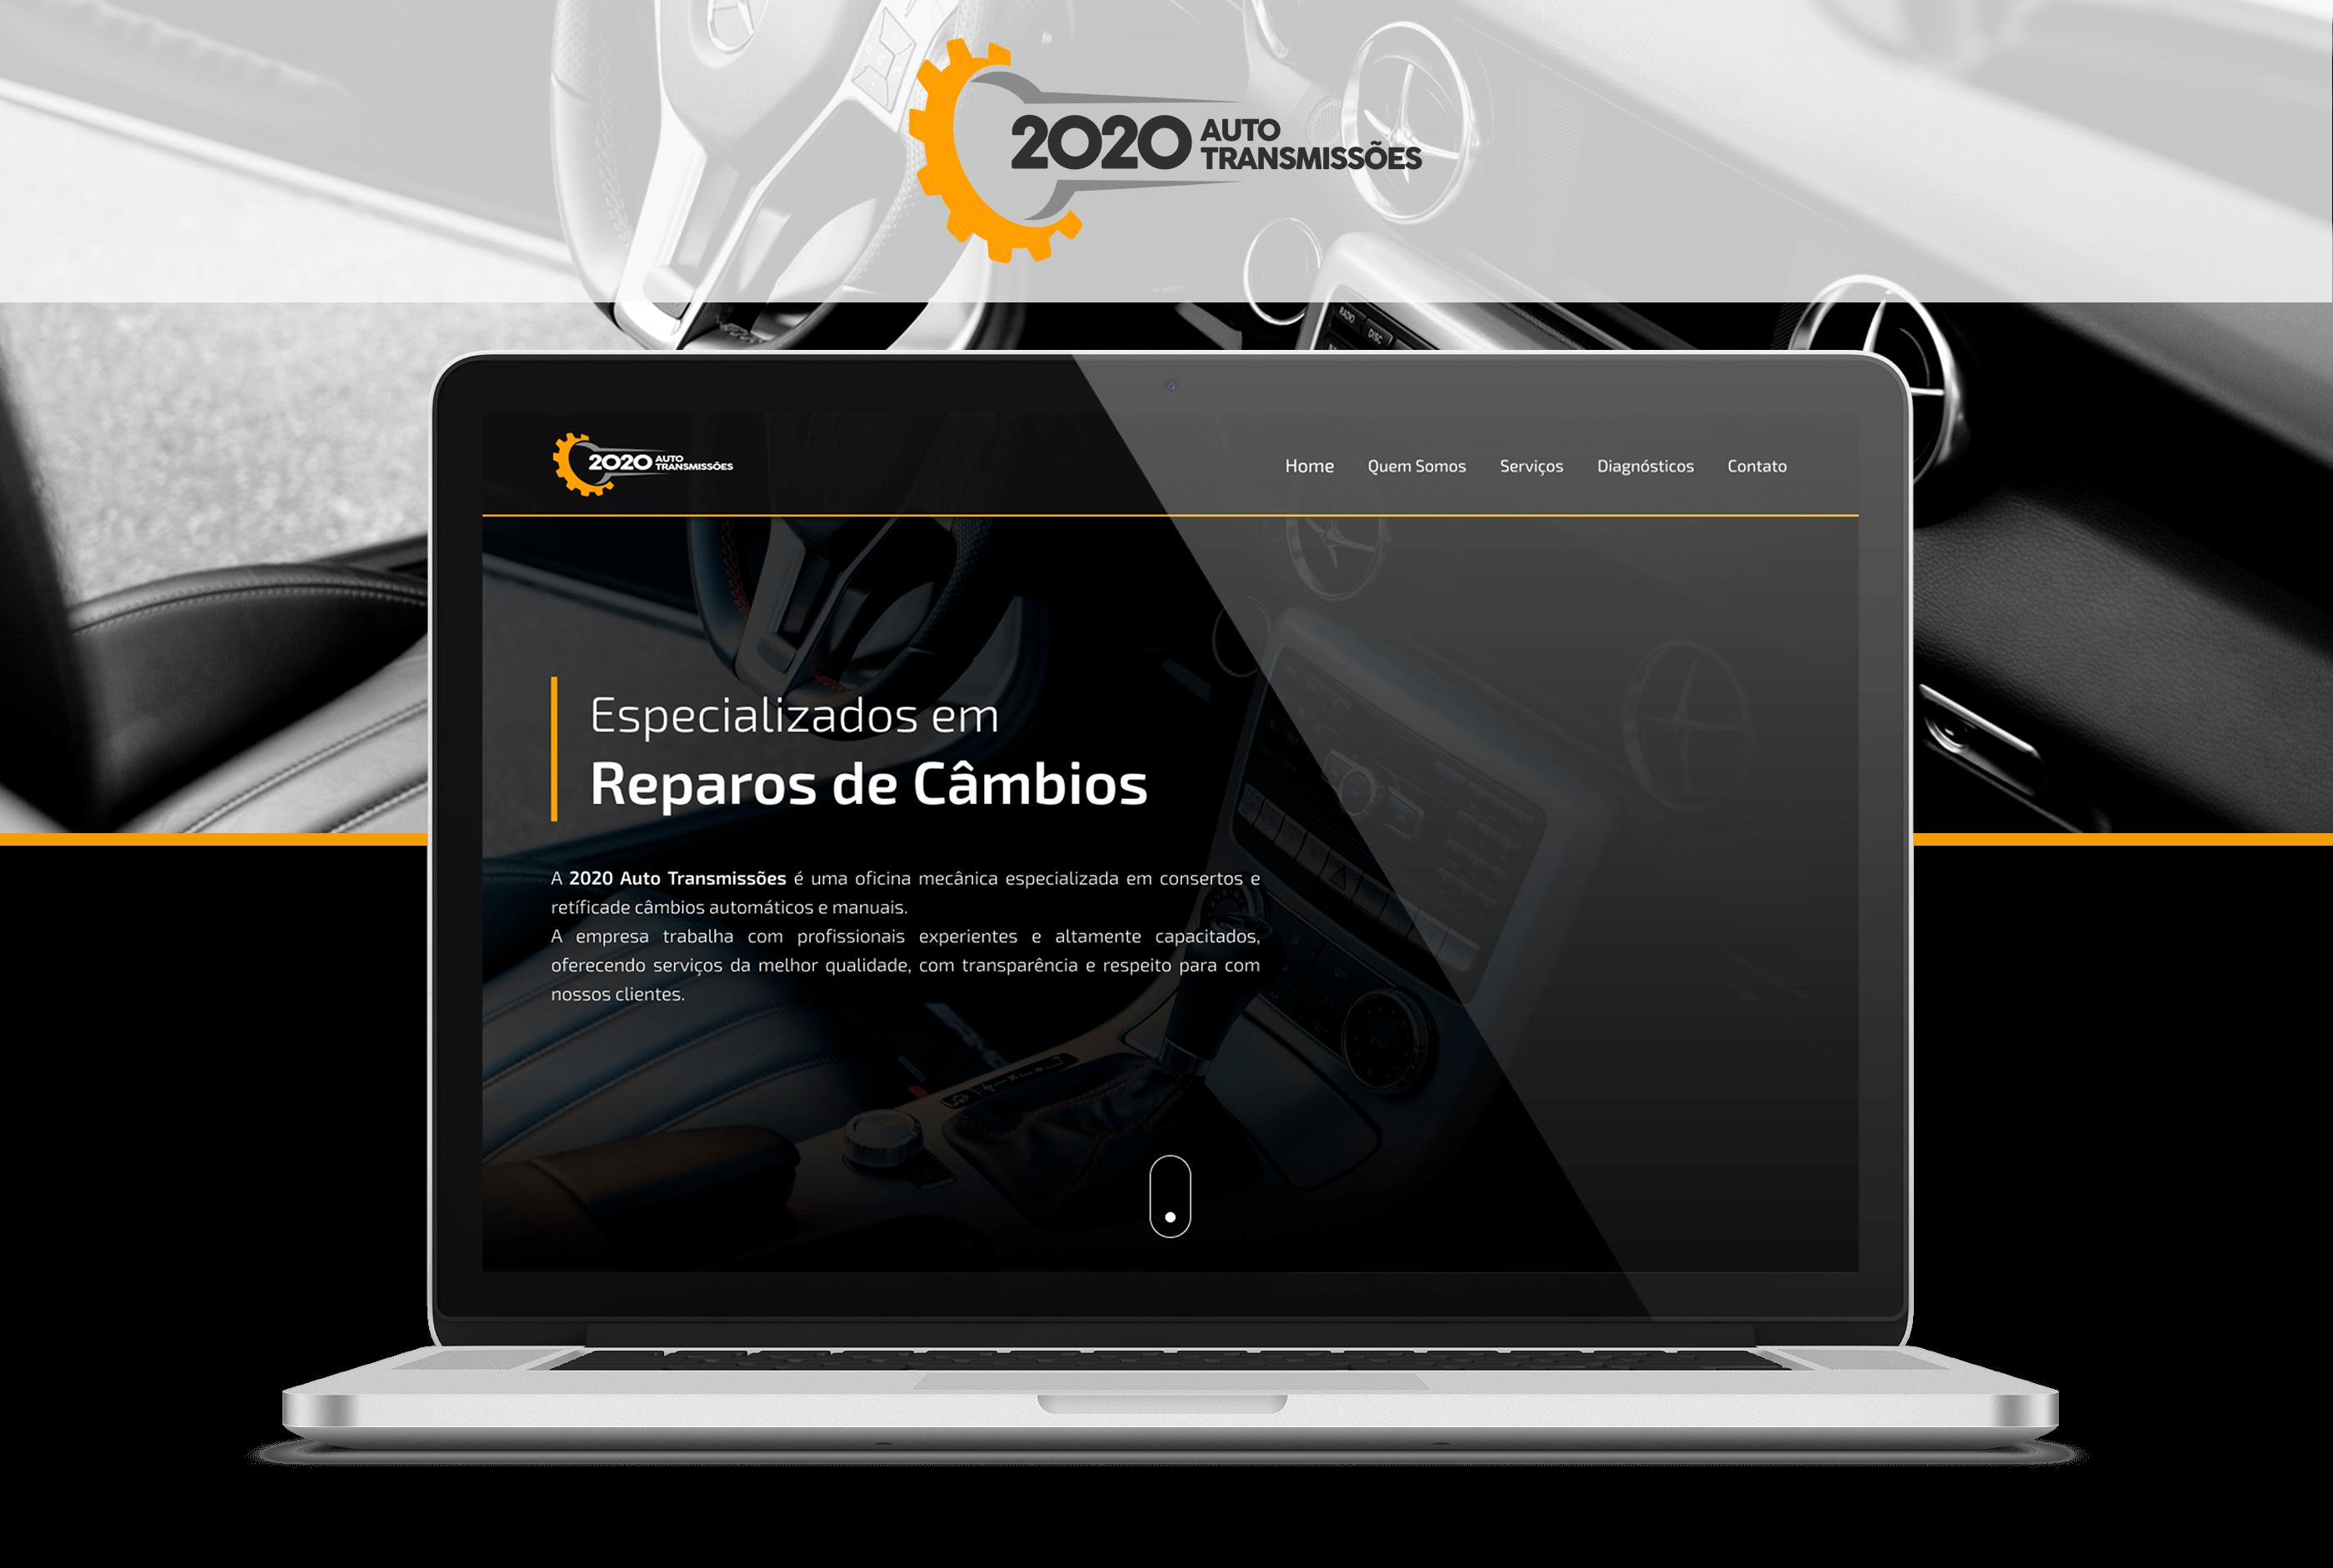 Projeto 2020 Auto Transmissões - Goognet Solução Digital